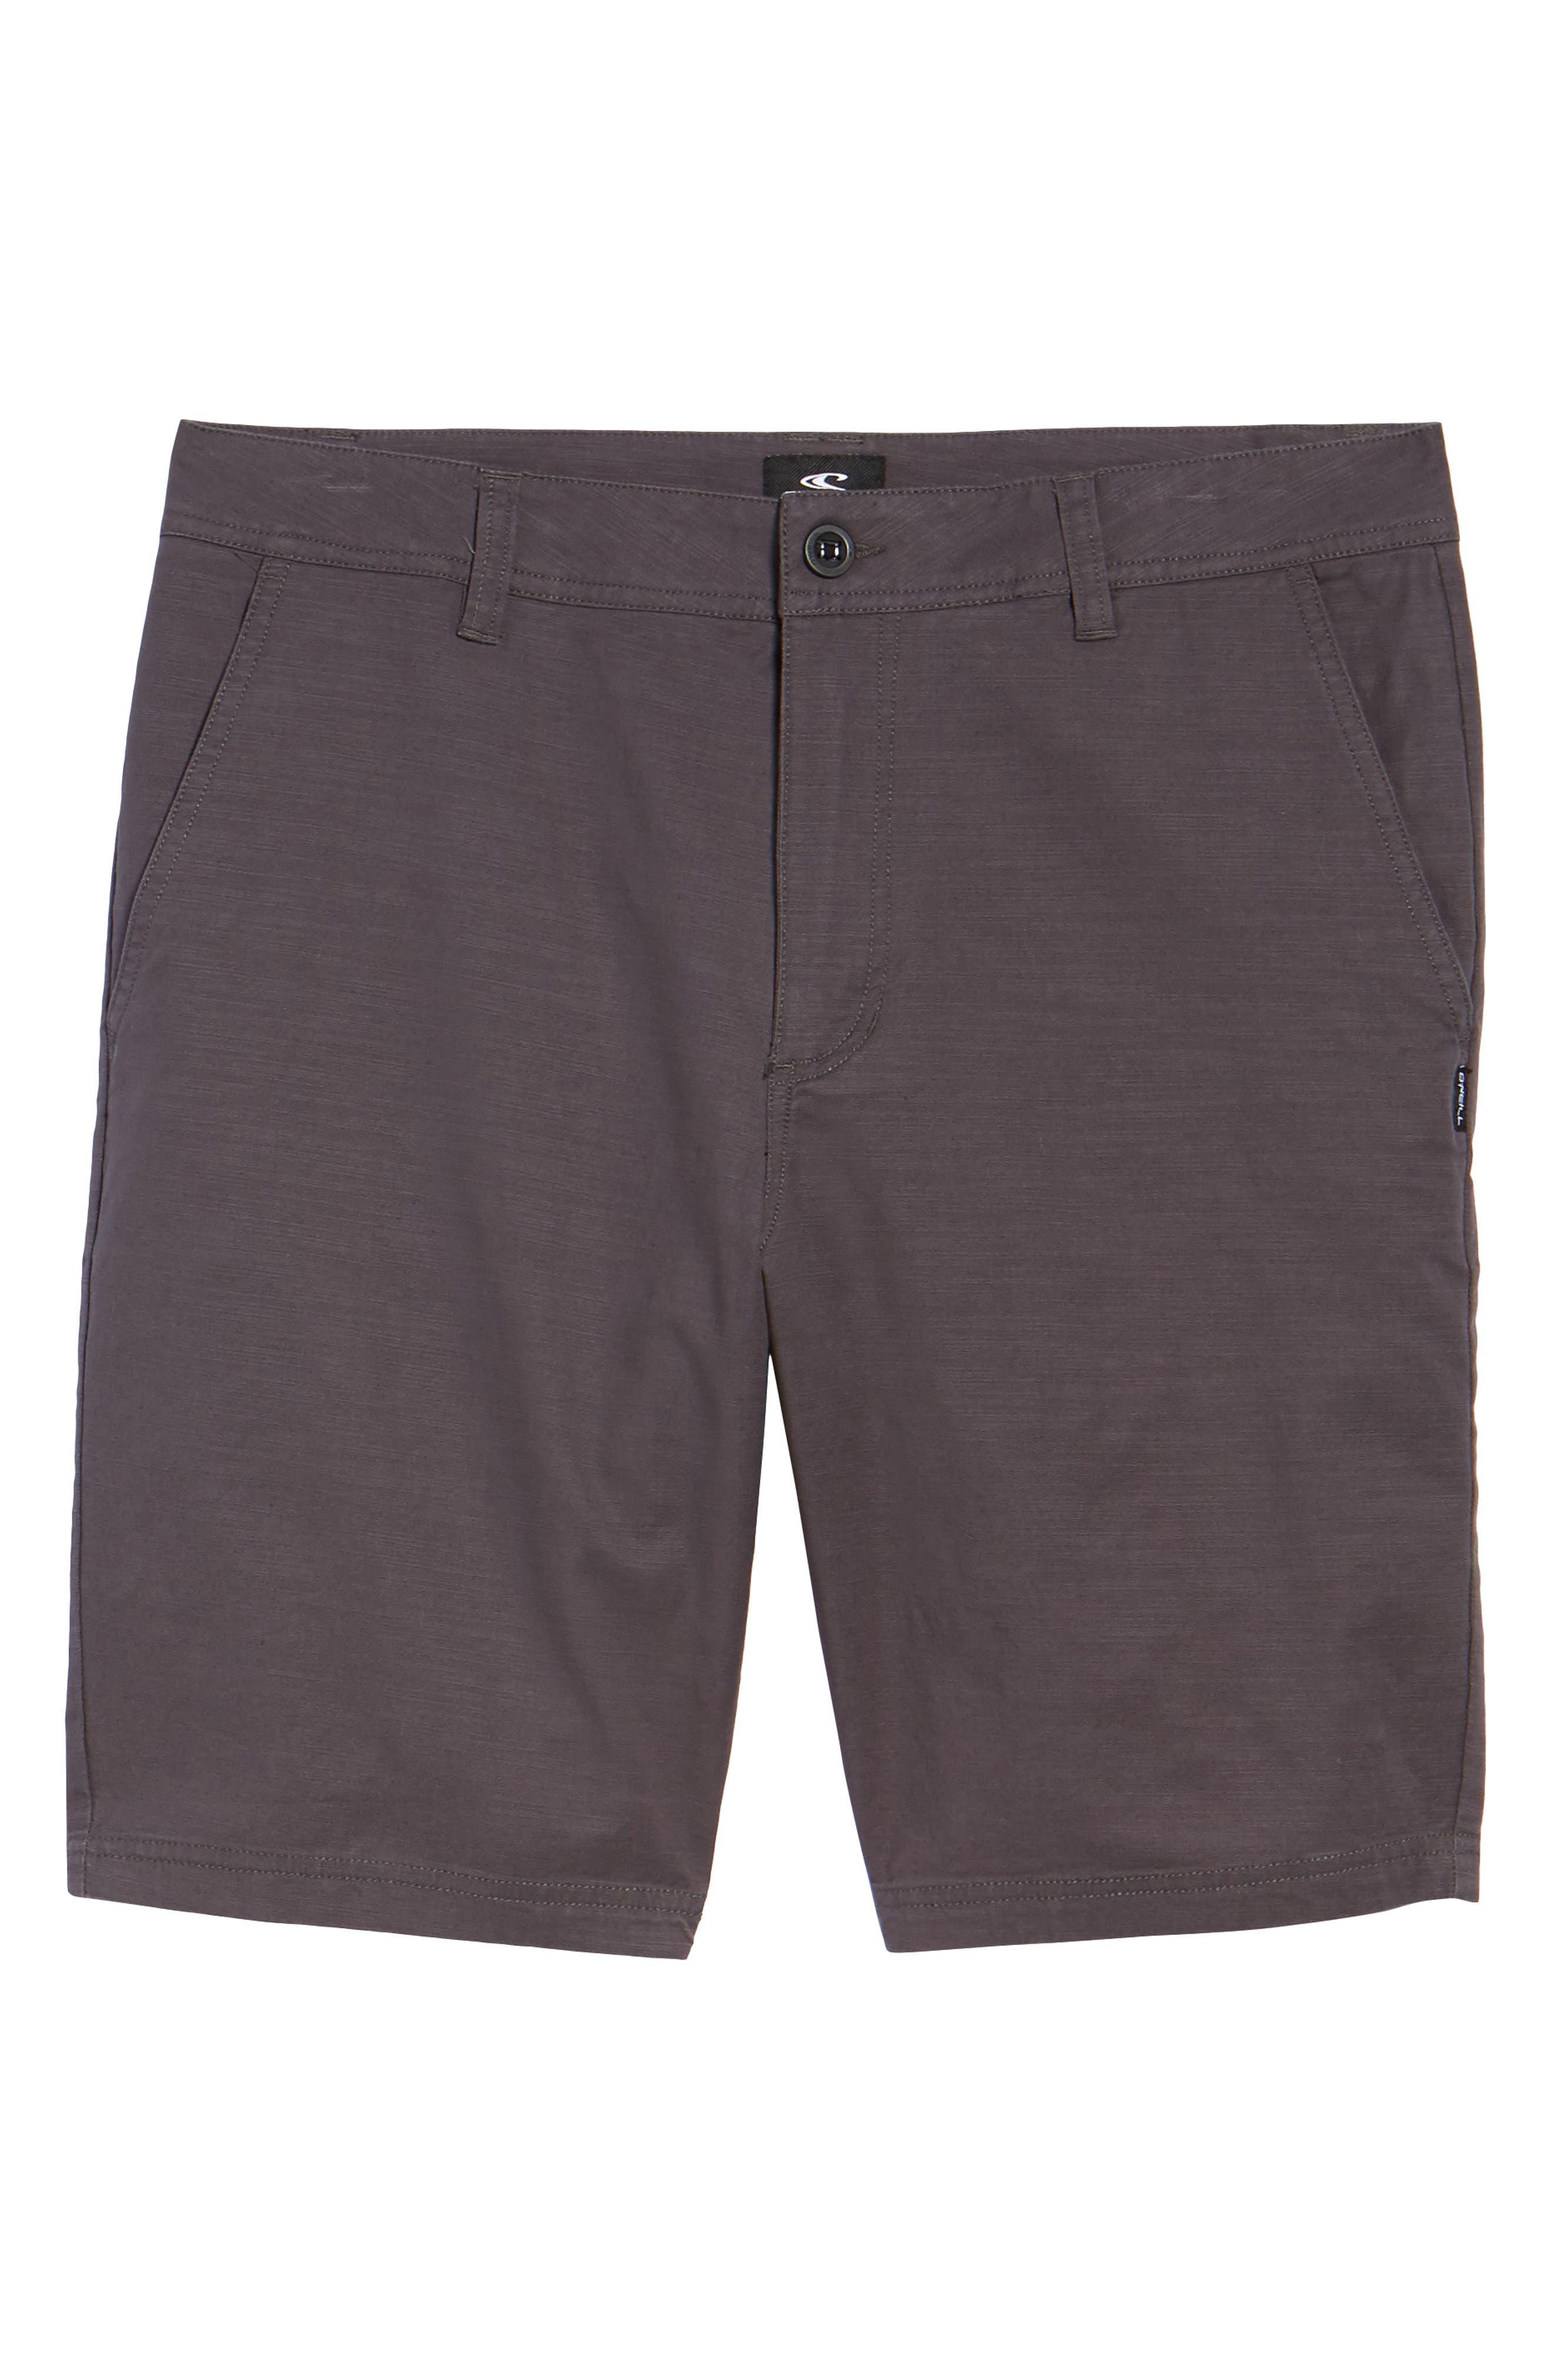 Jay Stretch Chino Shorts,                             Alternate thumbnail 28, color,